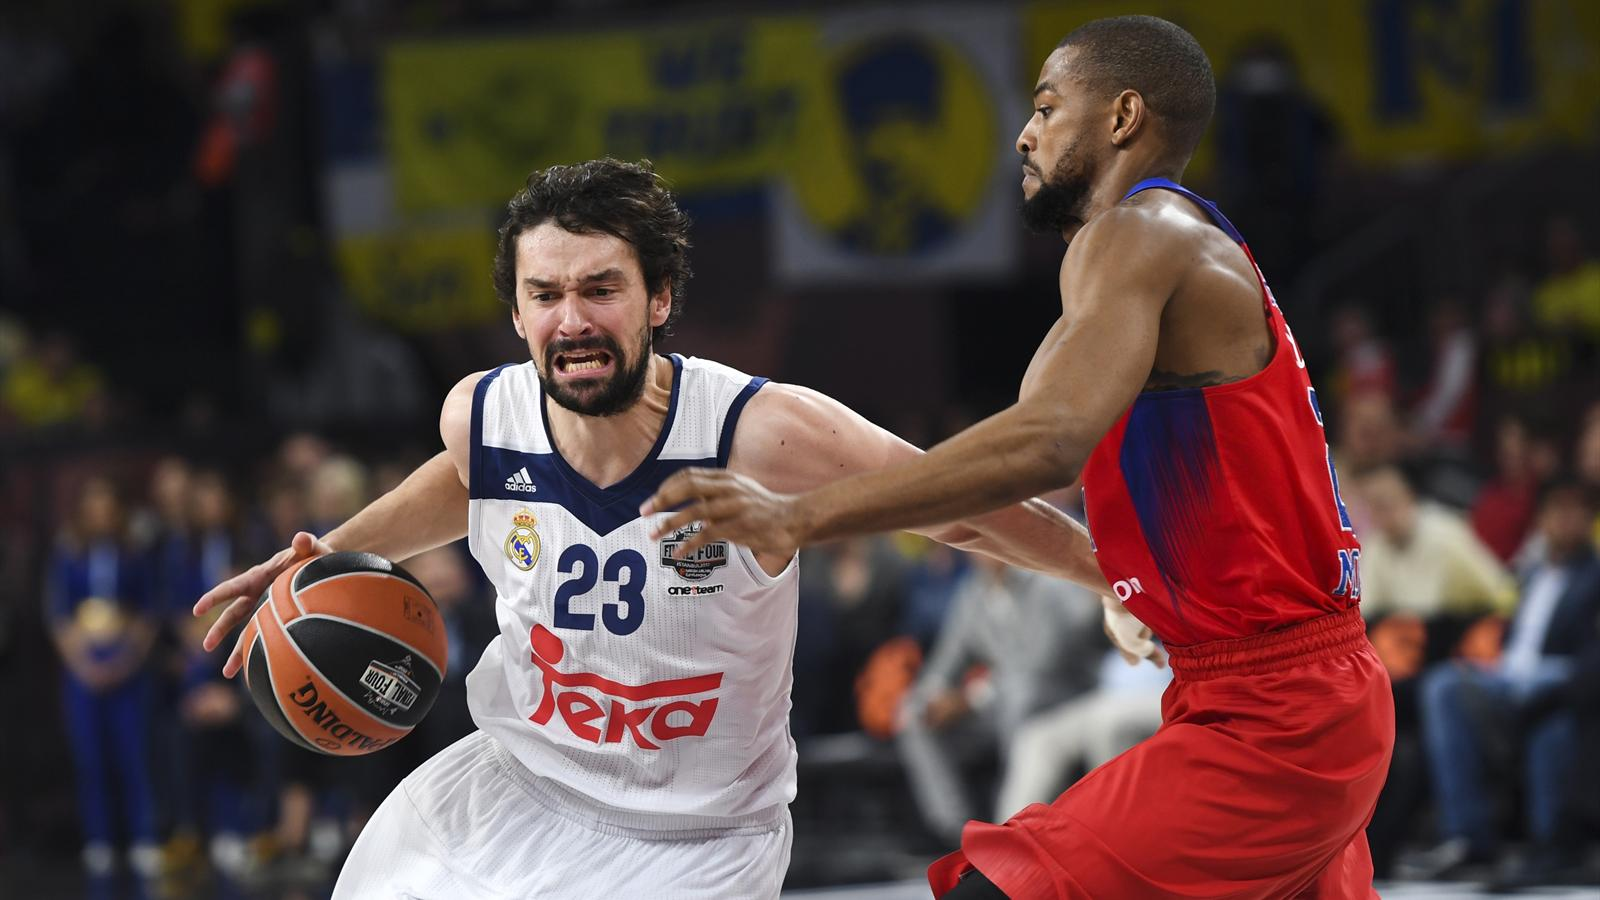 Валенсия Реал Баскетбол Прогноз Экспертов